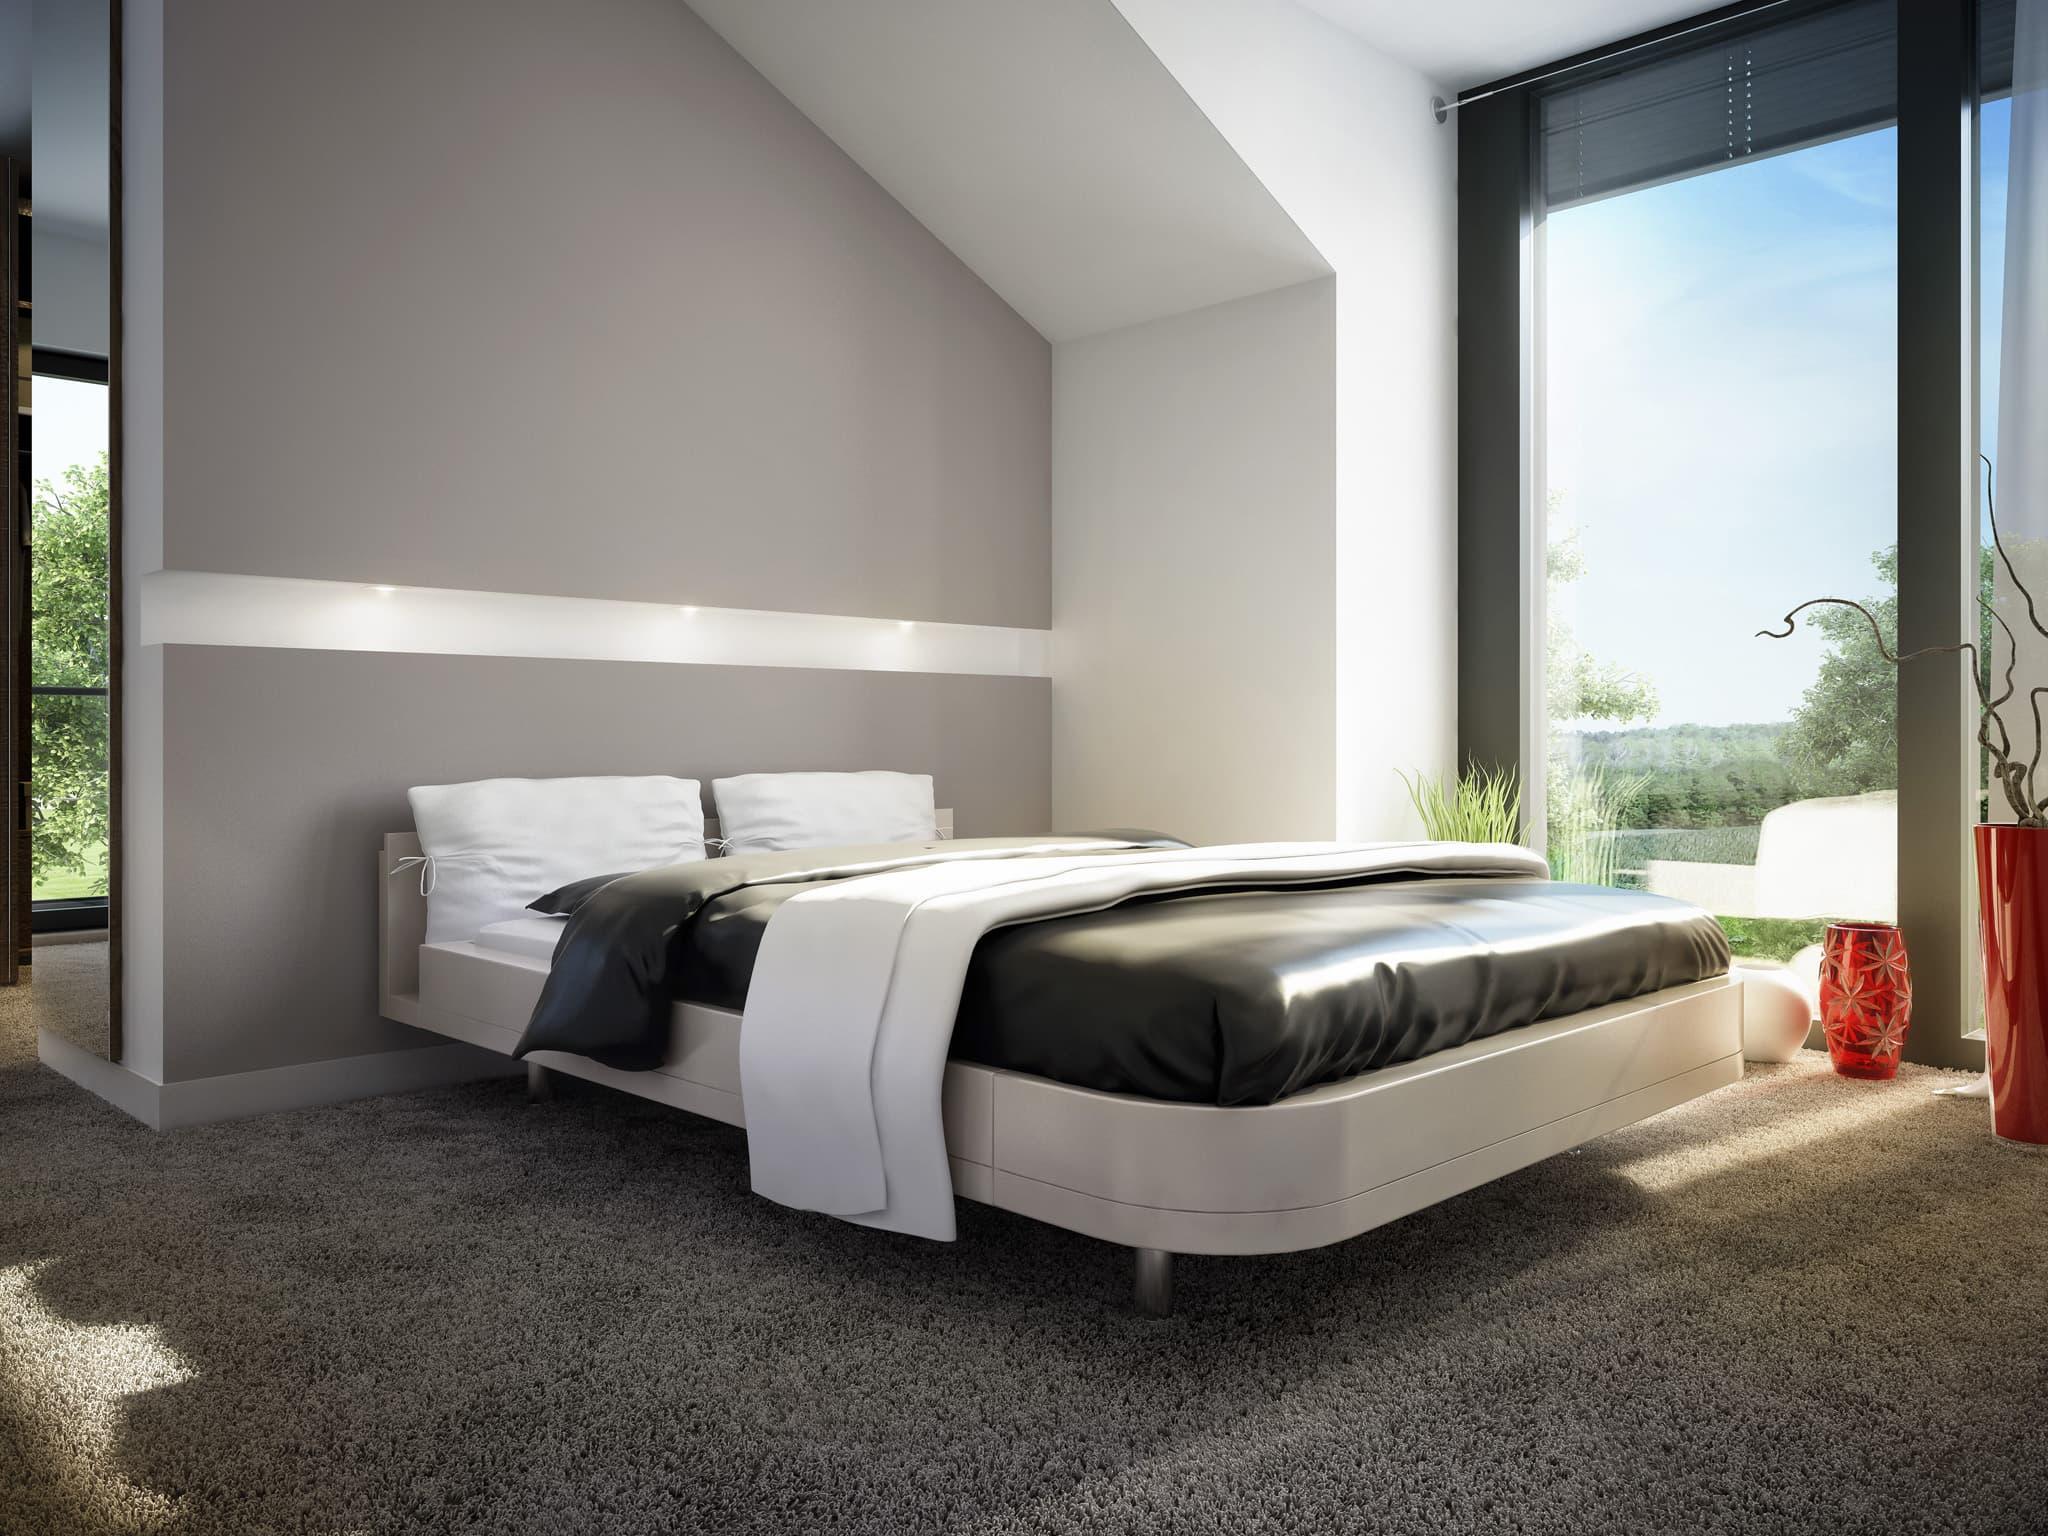 Schlafzimmer - Ideen Inneneinrichtung Einfamilienhaus Bien-Zenker Fertighaus CONCEPT-M Muenchen - HausbauDirekt.de